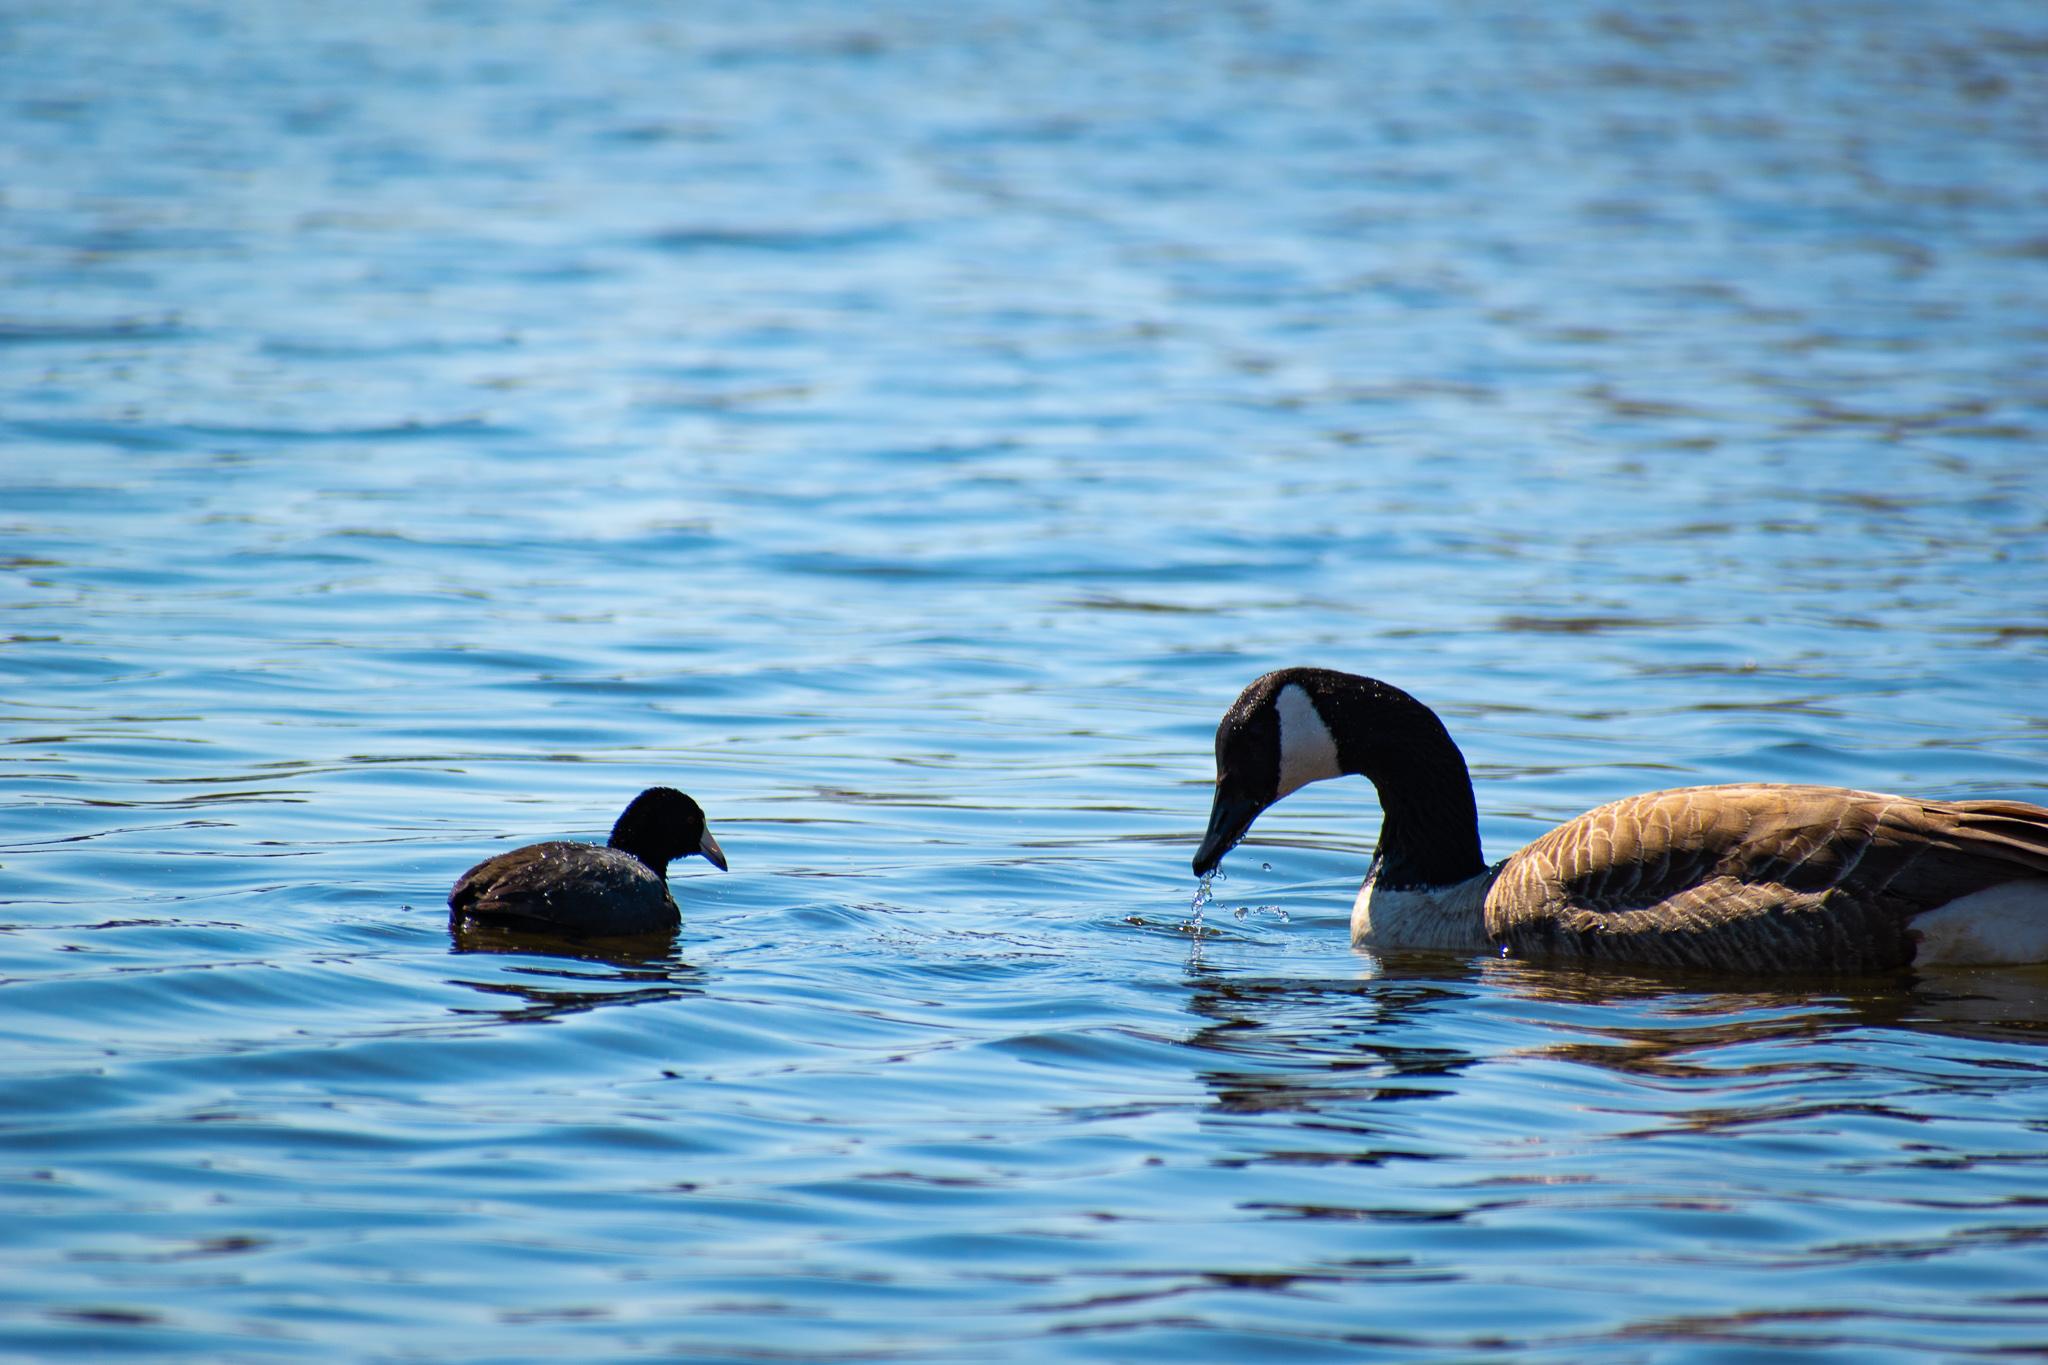 uprooted-traveler-lake-calhoun-ducks.jpg